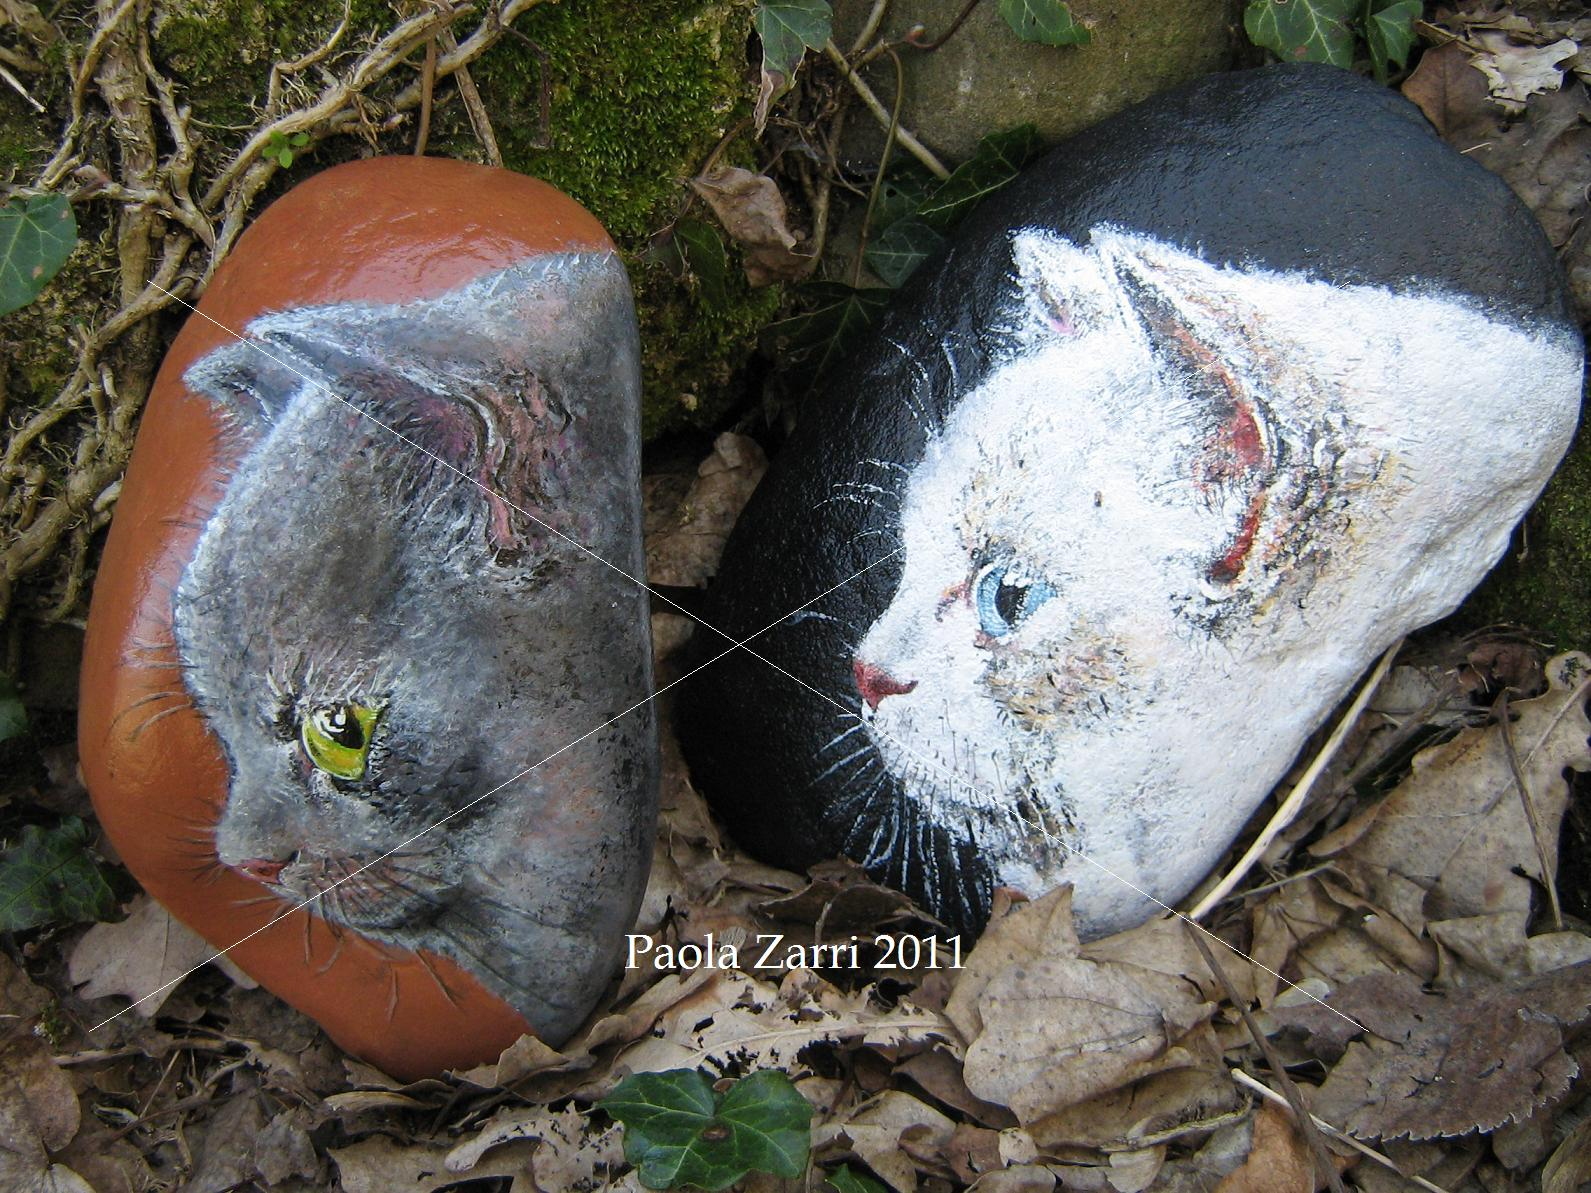 Pzcreazioni i sassi di paola for Sassi per tartarughe